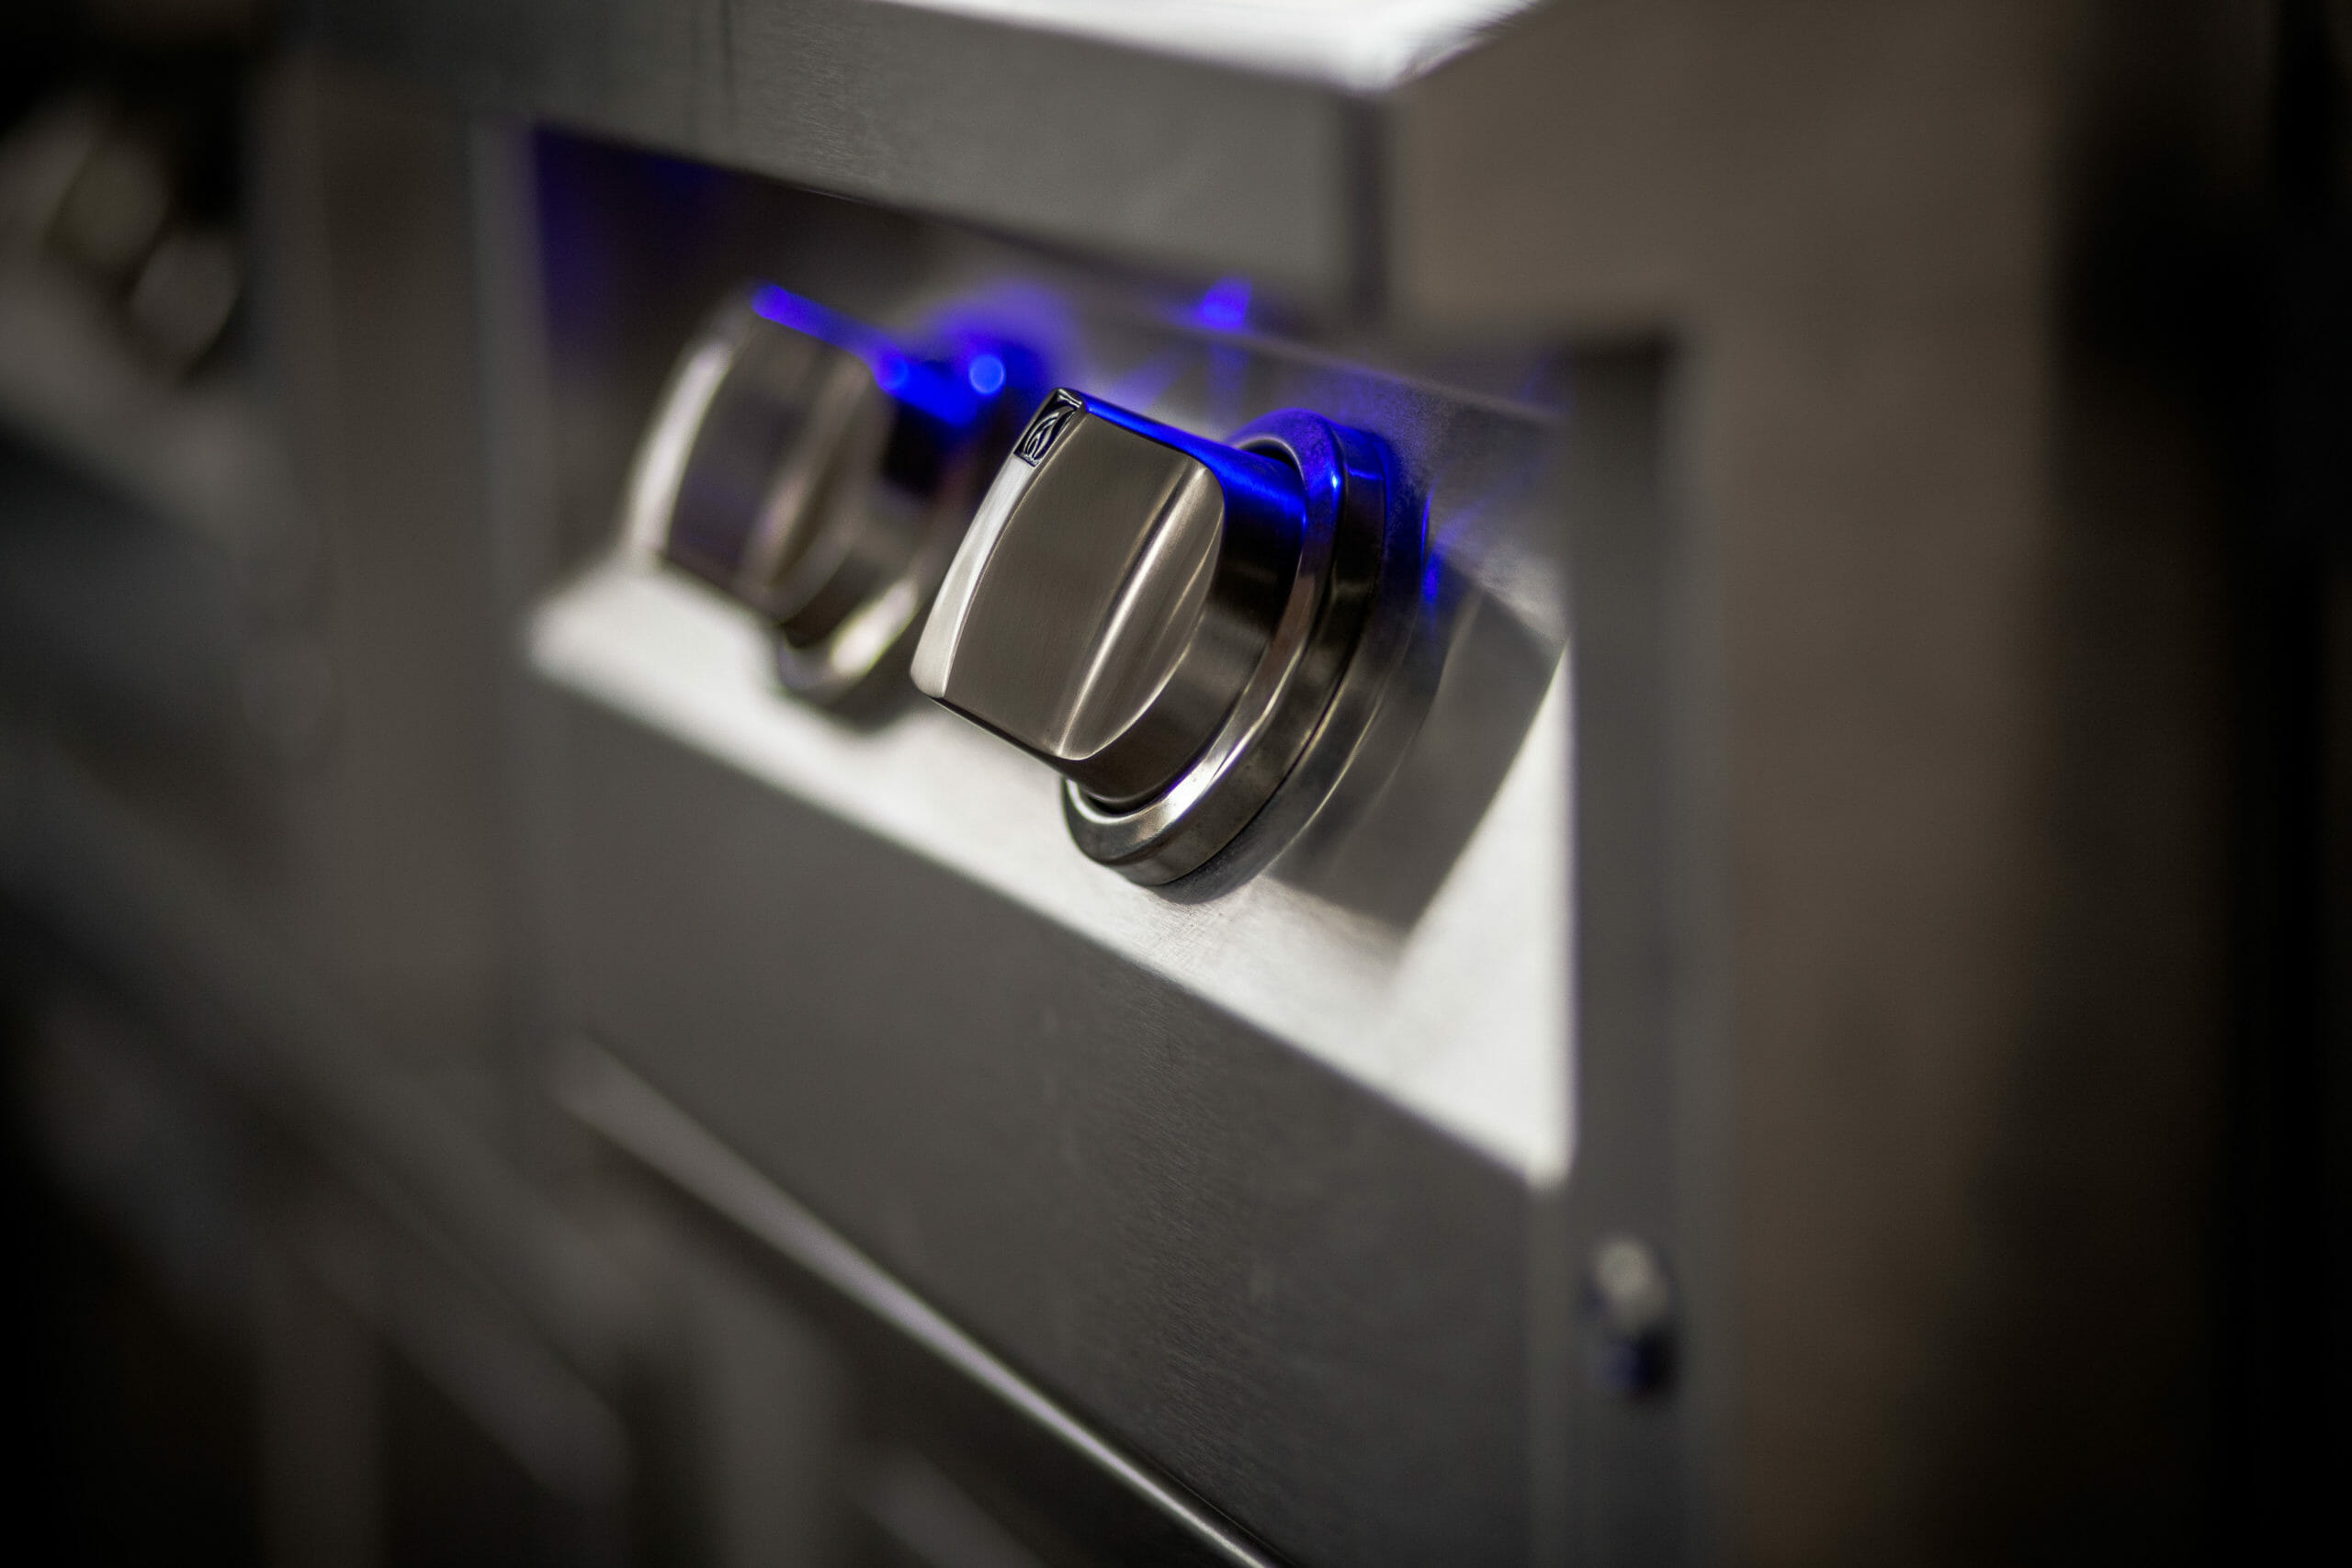 American Renaissance Grill Pro Burner LED lit knobs